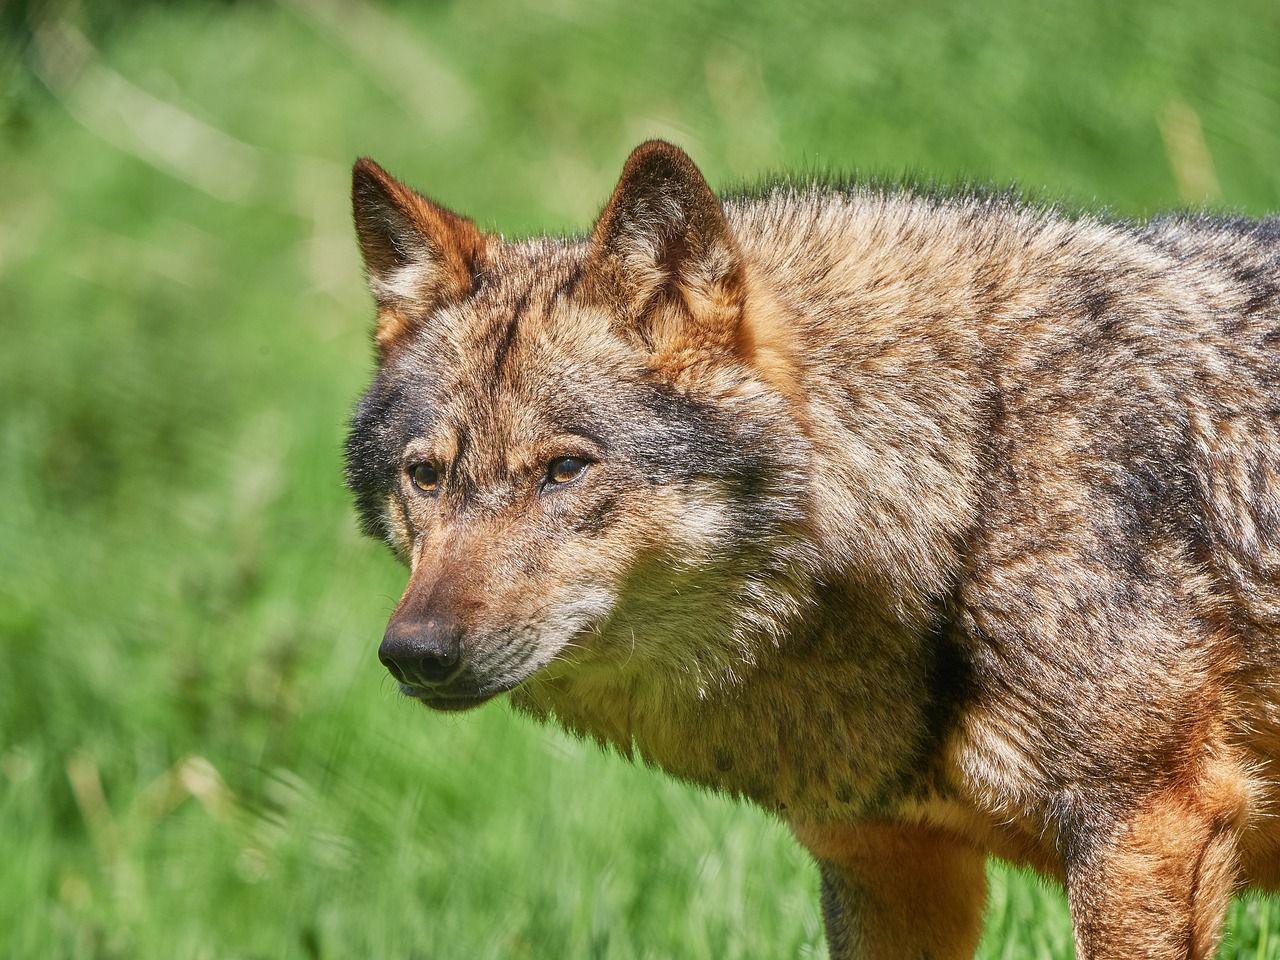 Forest, Wolf, Scheu, Nature, Forest, Animal forest, wolf